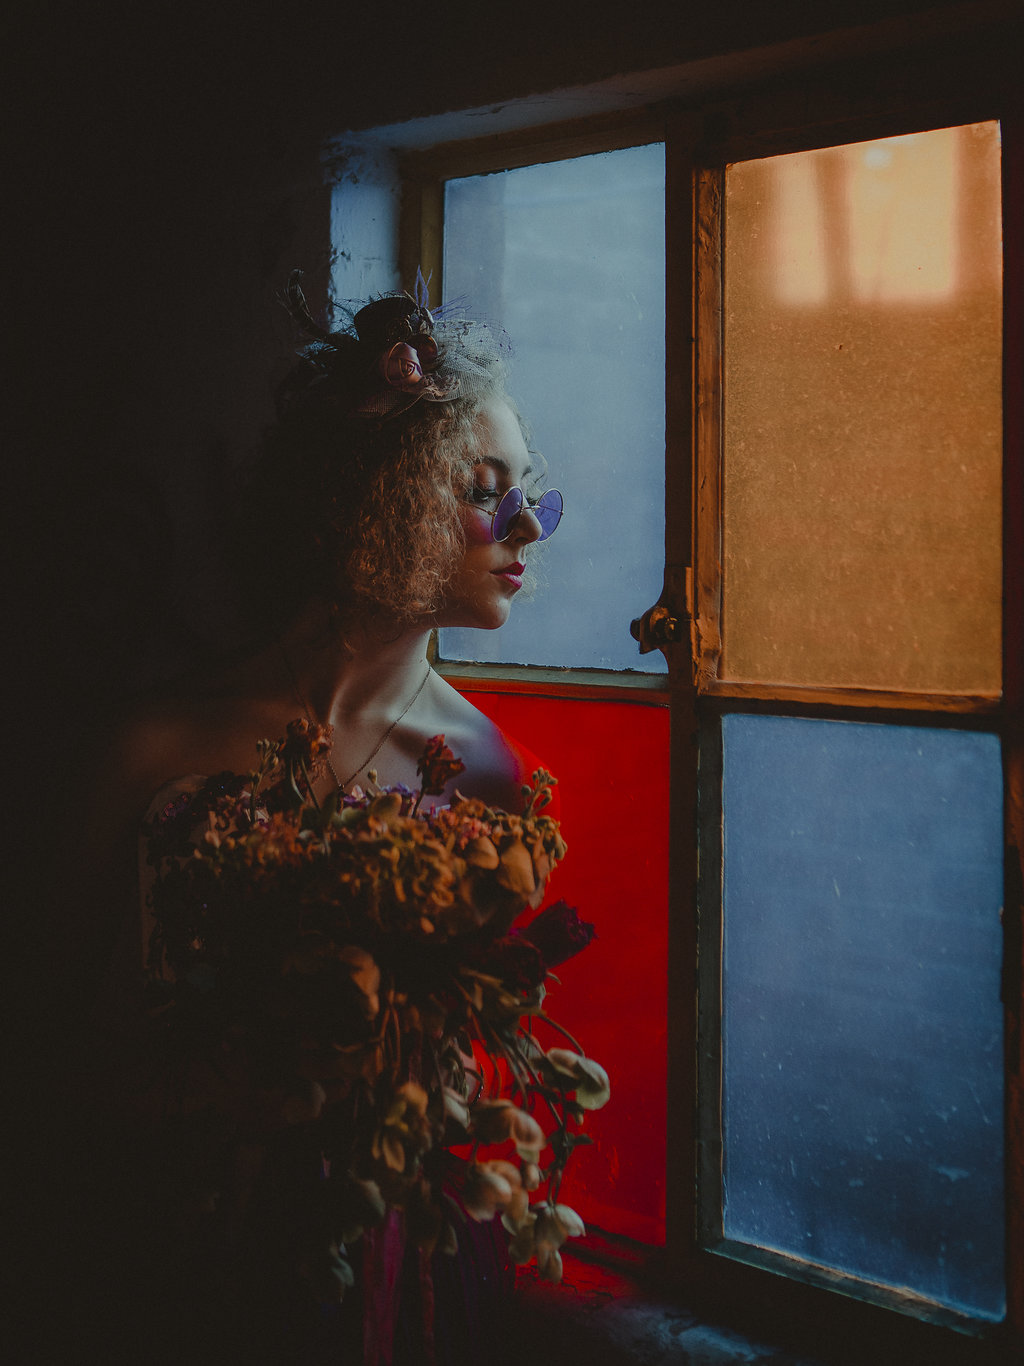 Studio Fotografico Bacci - Steampunk wedding - alternative wedding 3